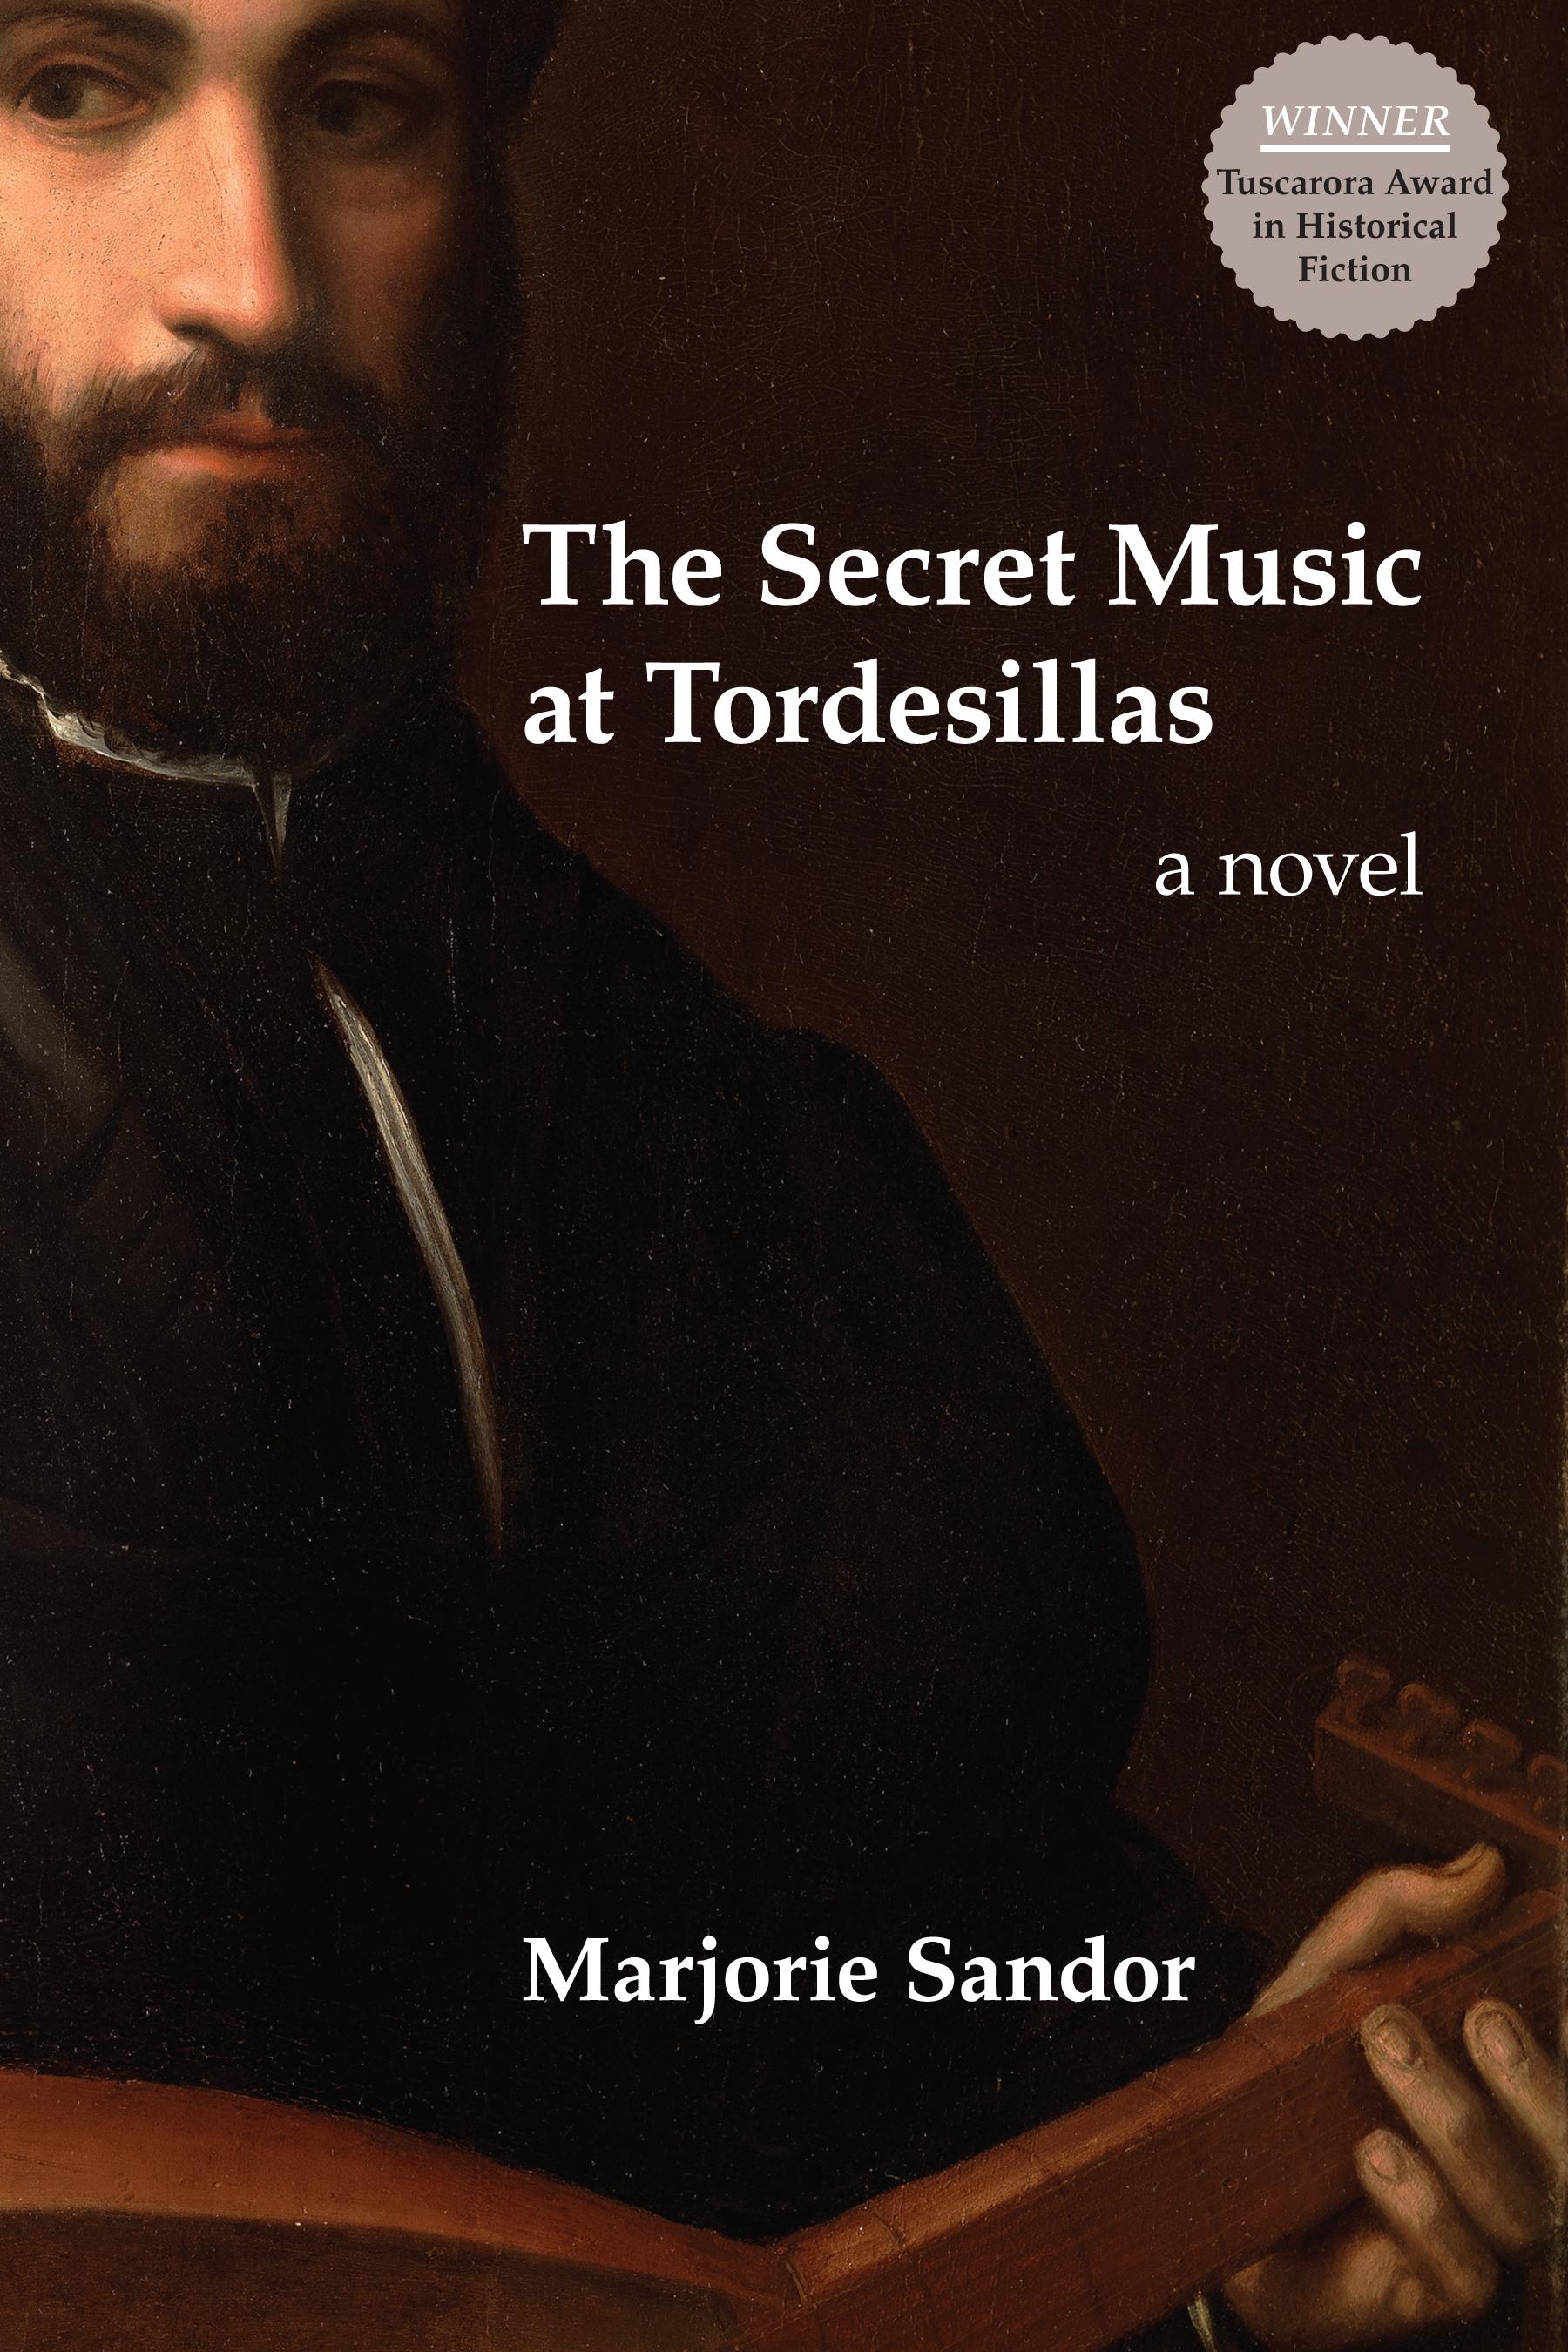 The Secret Music at Tordesillas